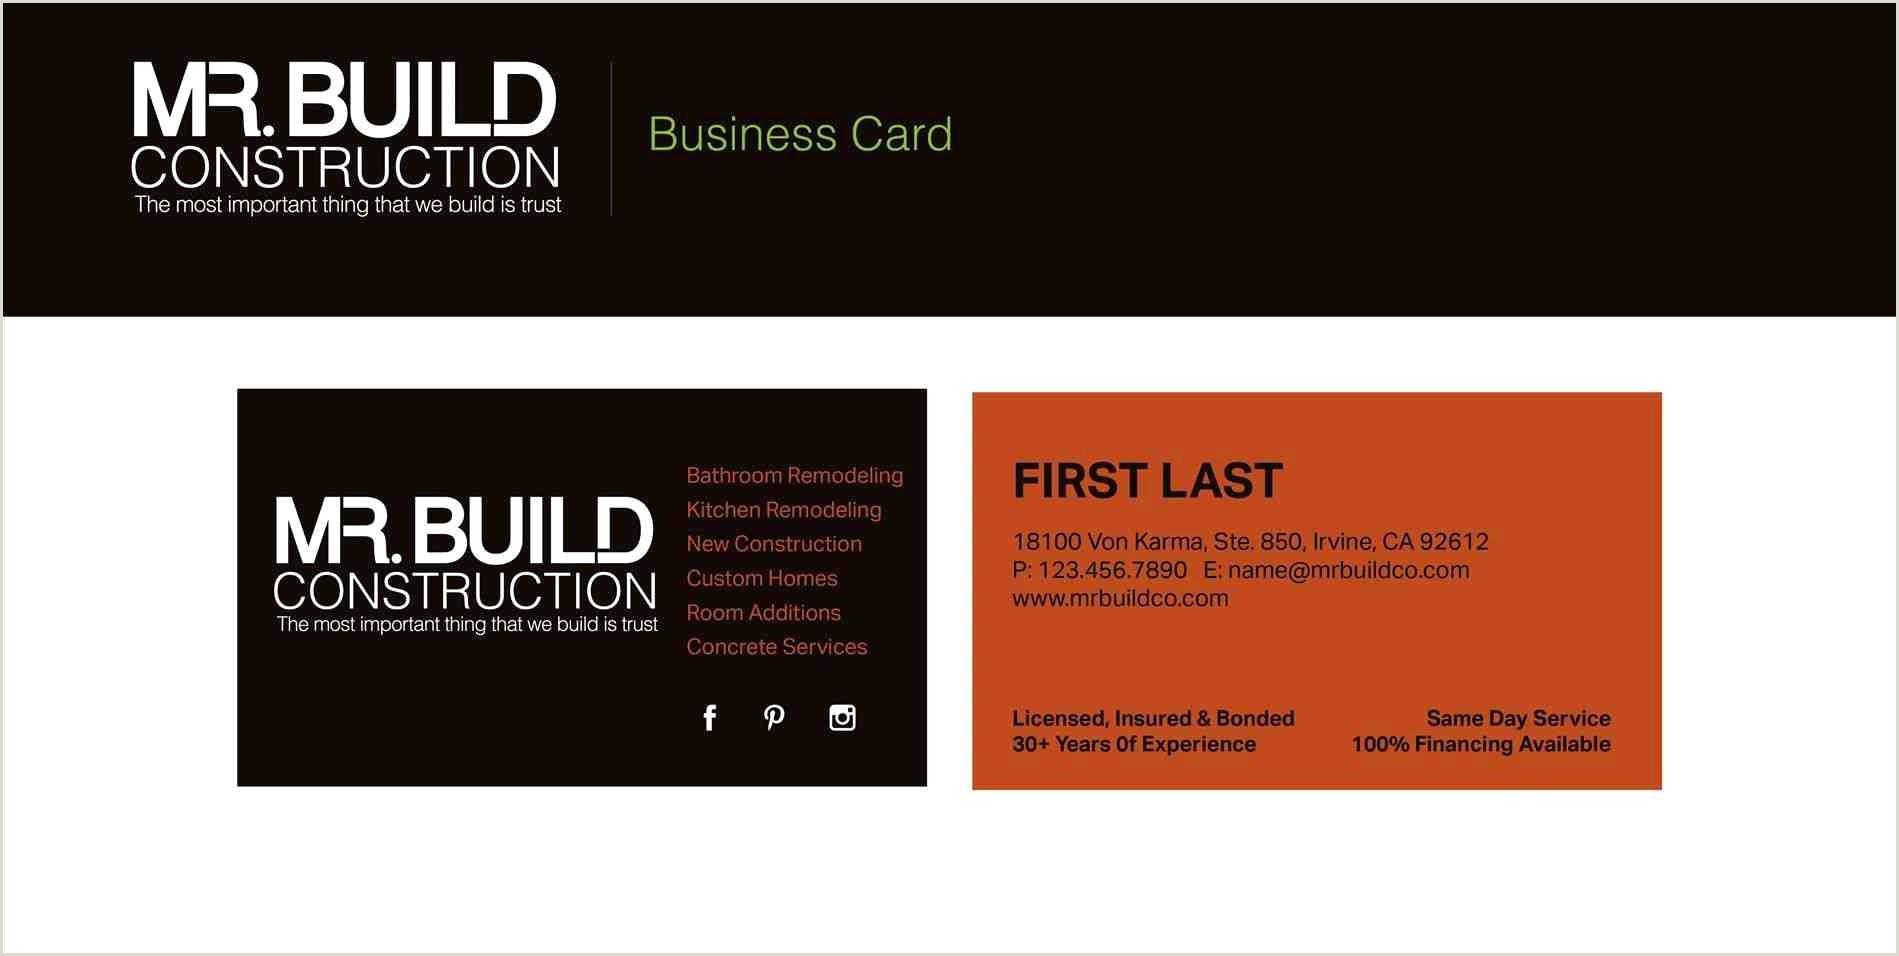 We Buy Houses Business Card Templates 14 Popular Hardwood Flooring Business Card Template